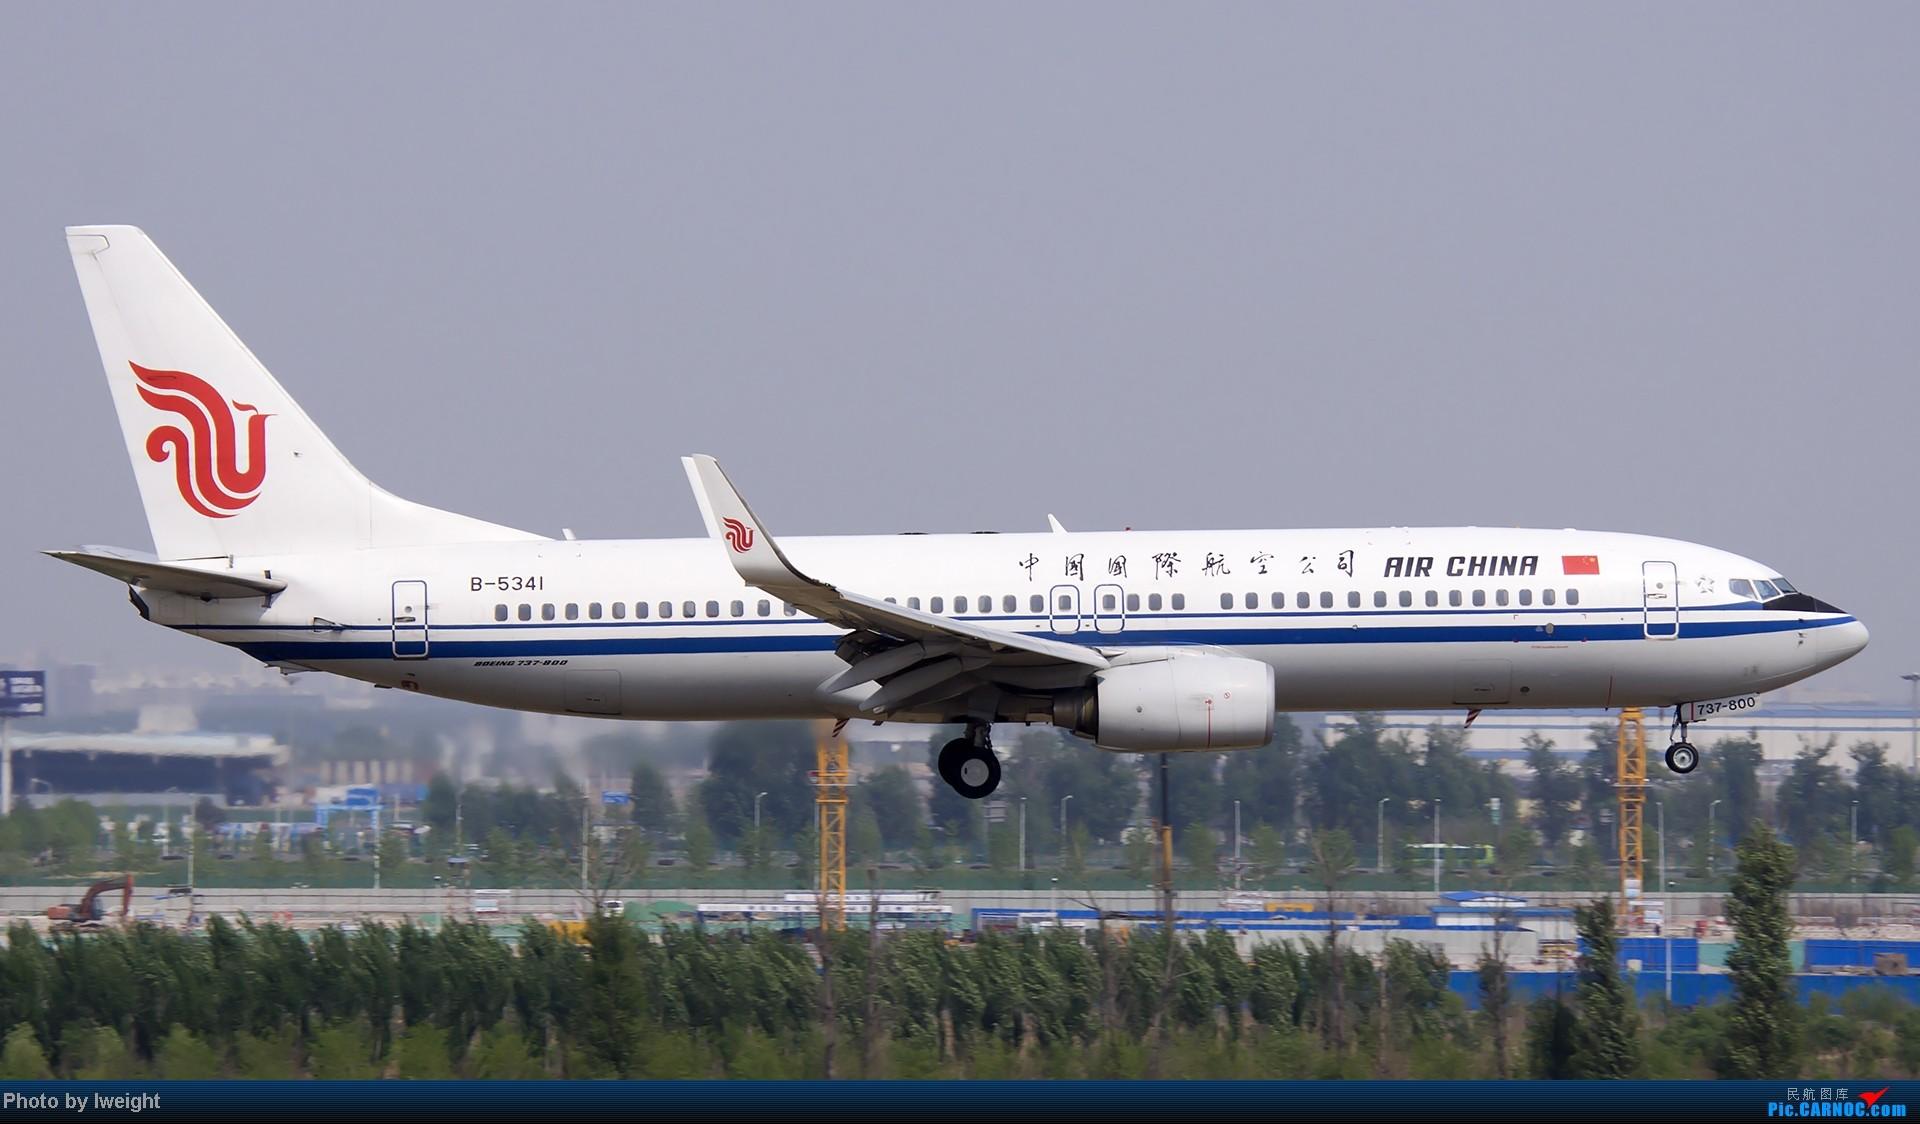 Re:[原创]错过了卡航的巴塞罗那号,只有这些大路货了,泪奔啊 BOEING 737-800 B-5341 中国北京首都机场